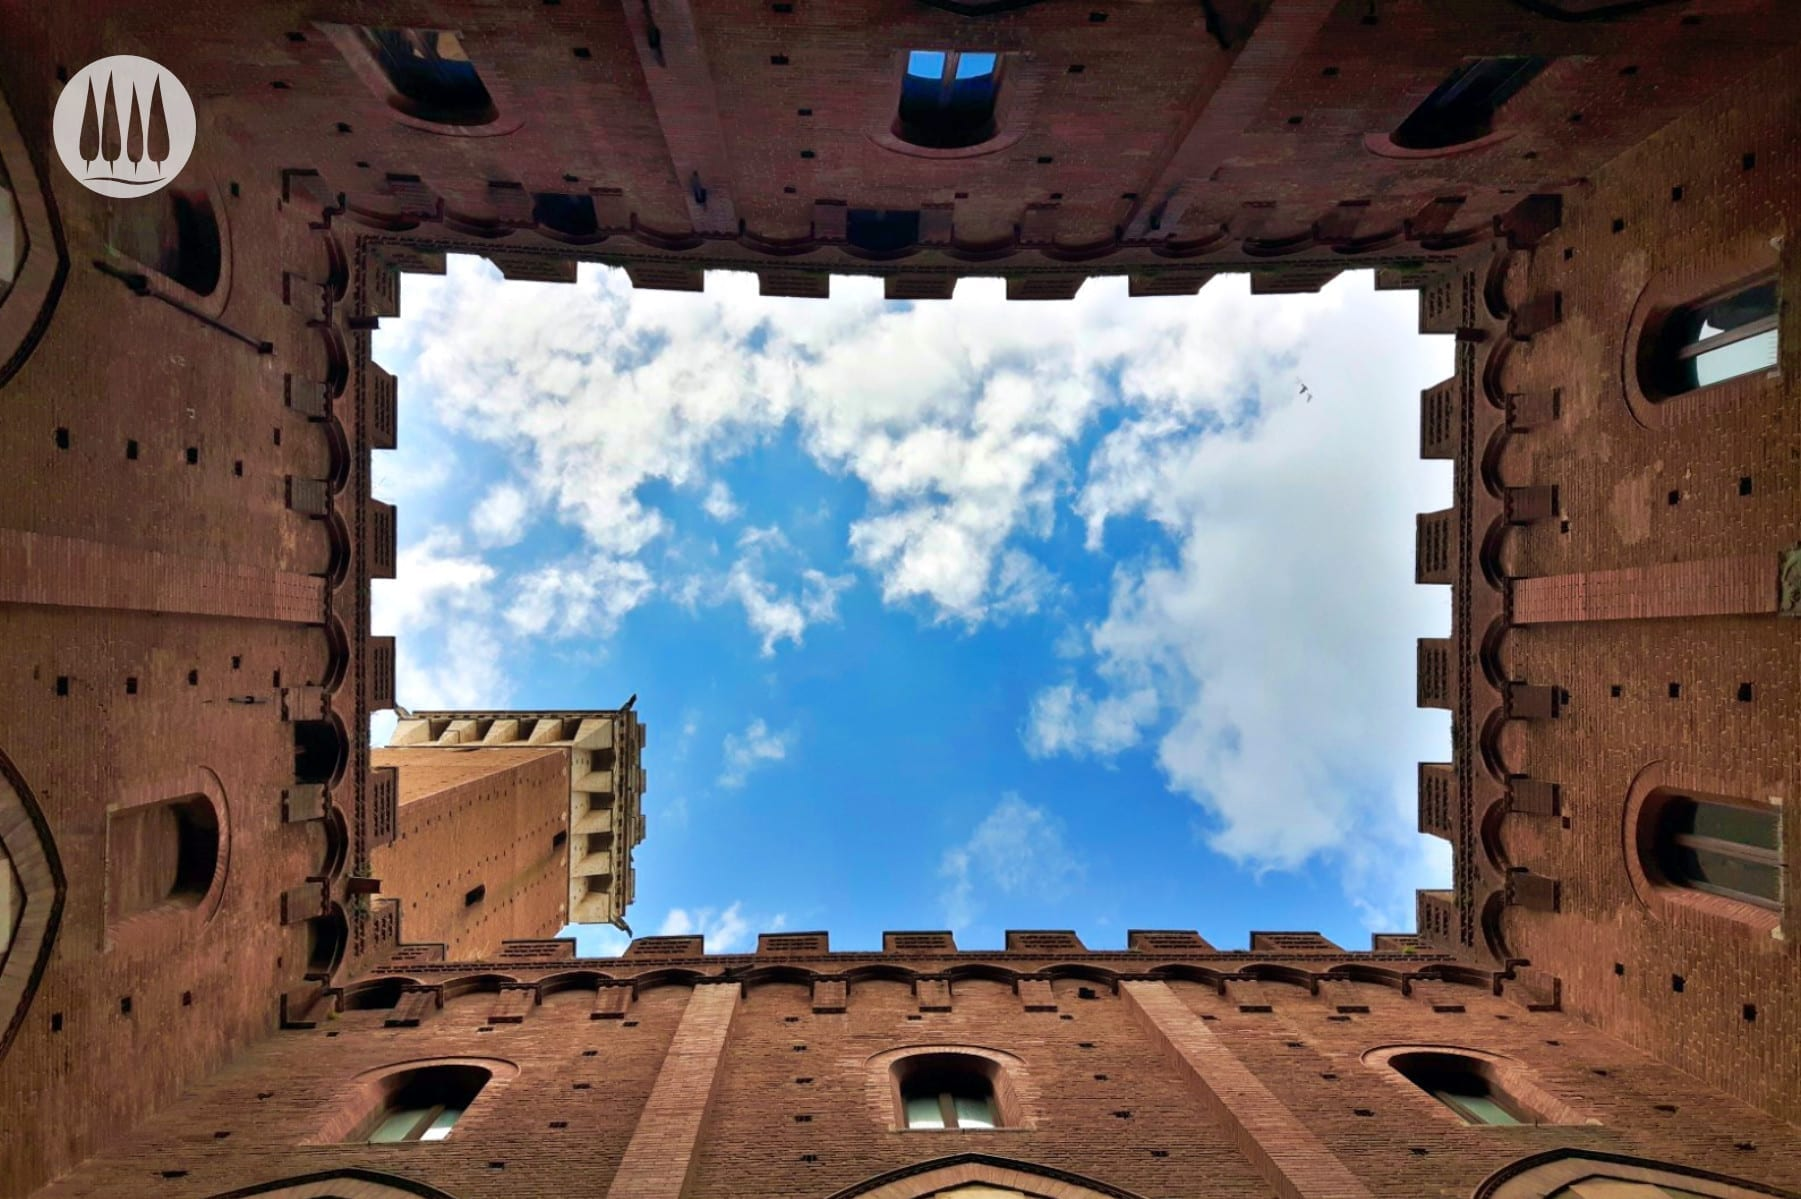 Innenhof des Rathauses /Siena